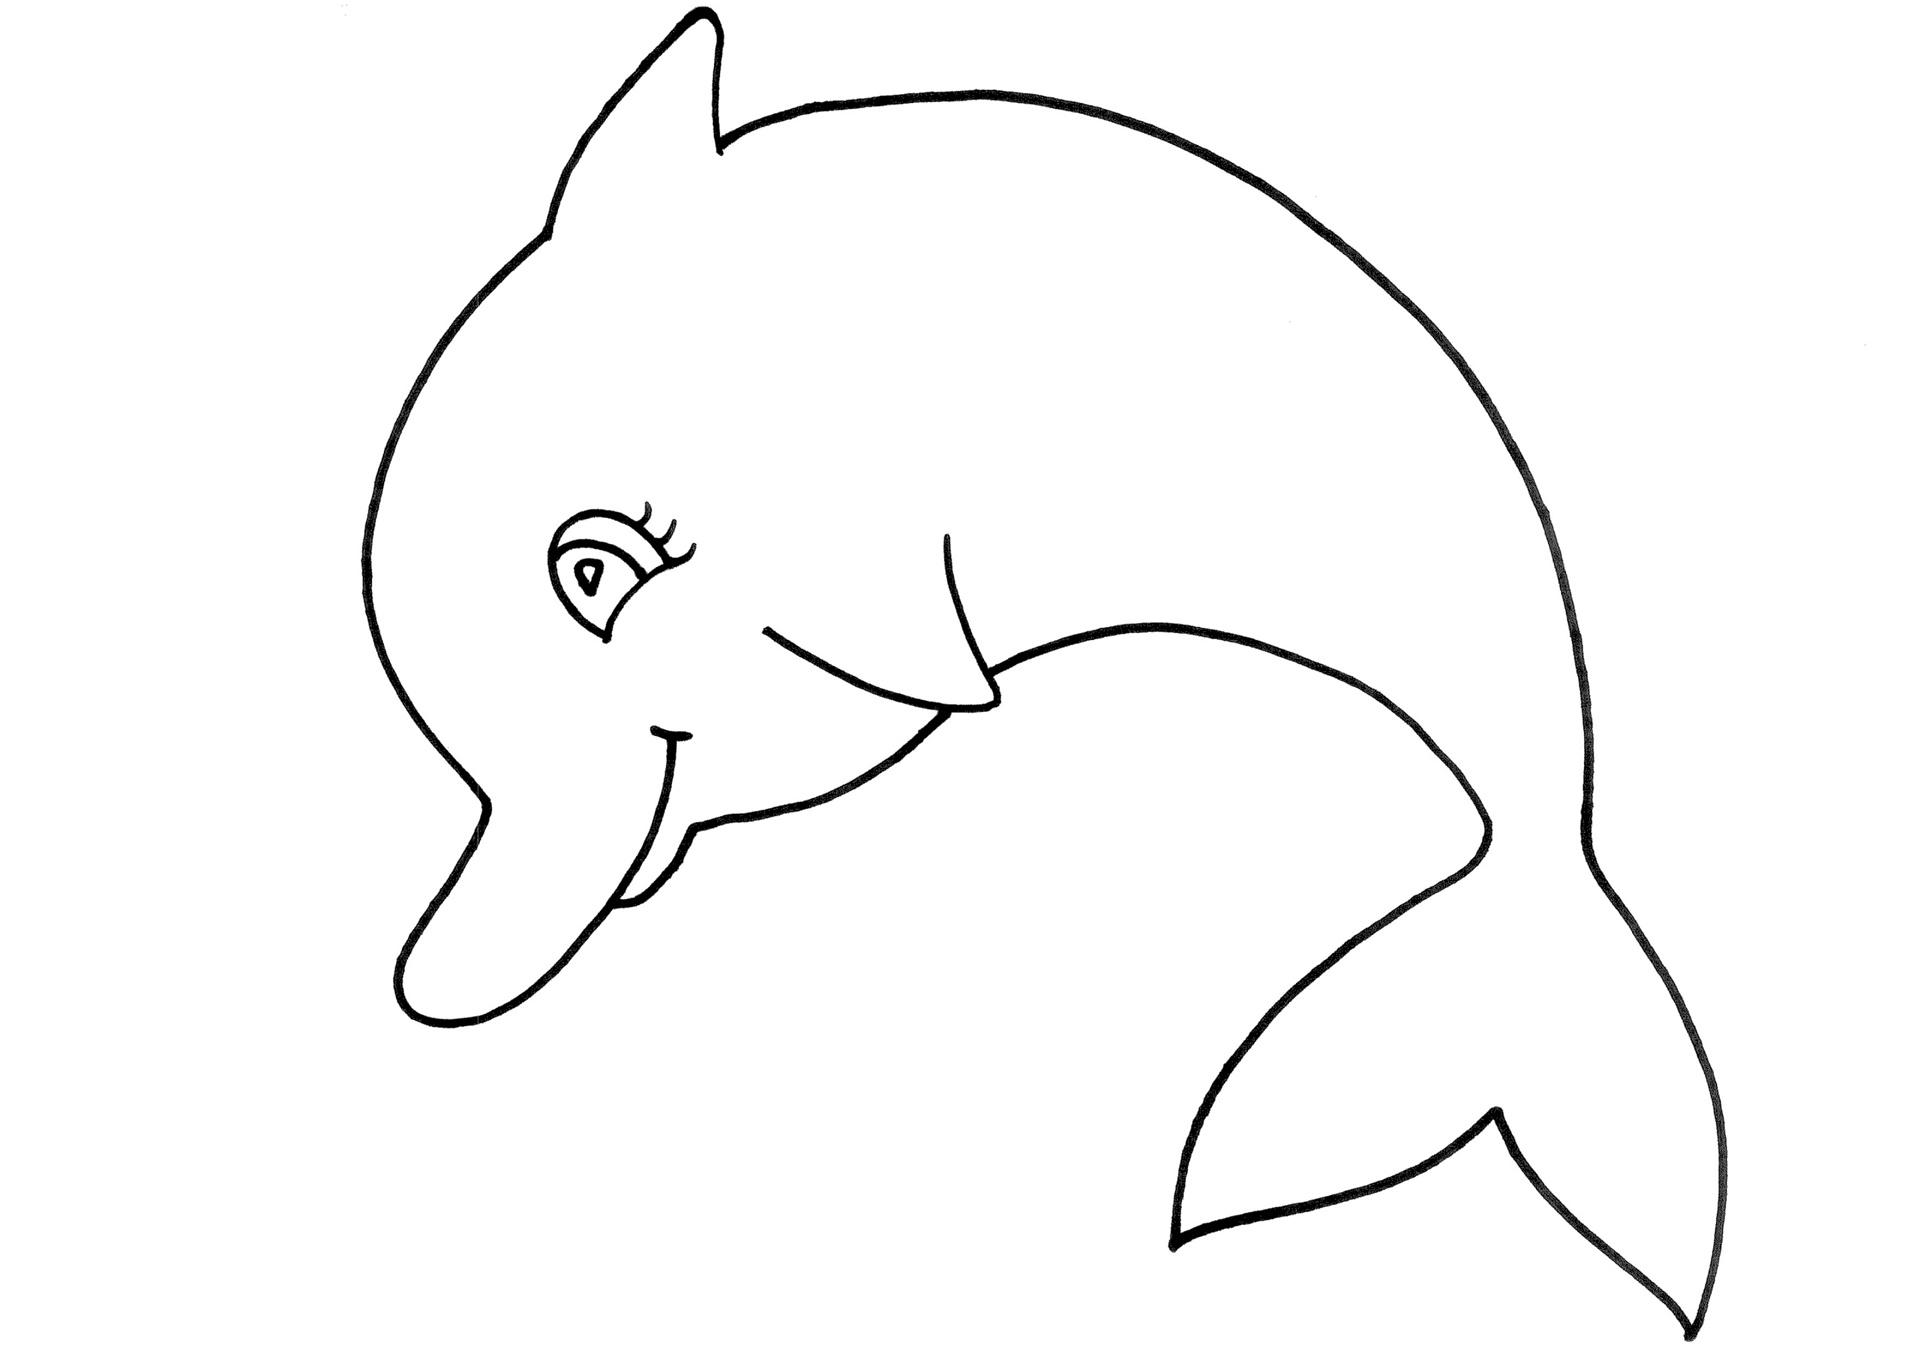 Dibujos Varios Para Colorear: Dibujos De Animales Para Colorear, Pintar E Imprimir Gratis